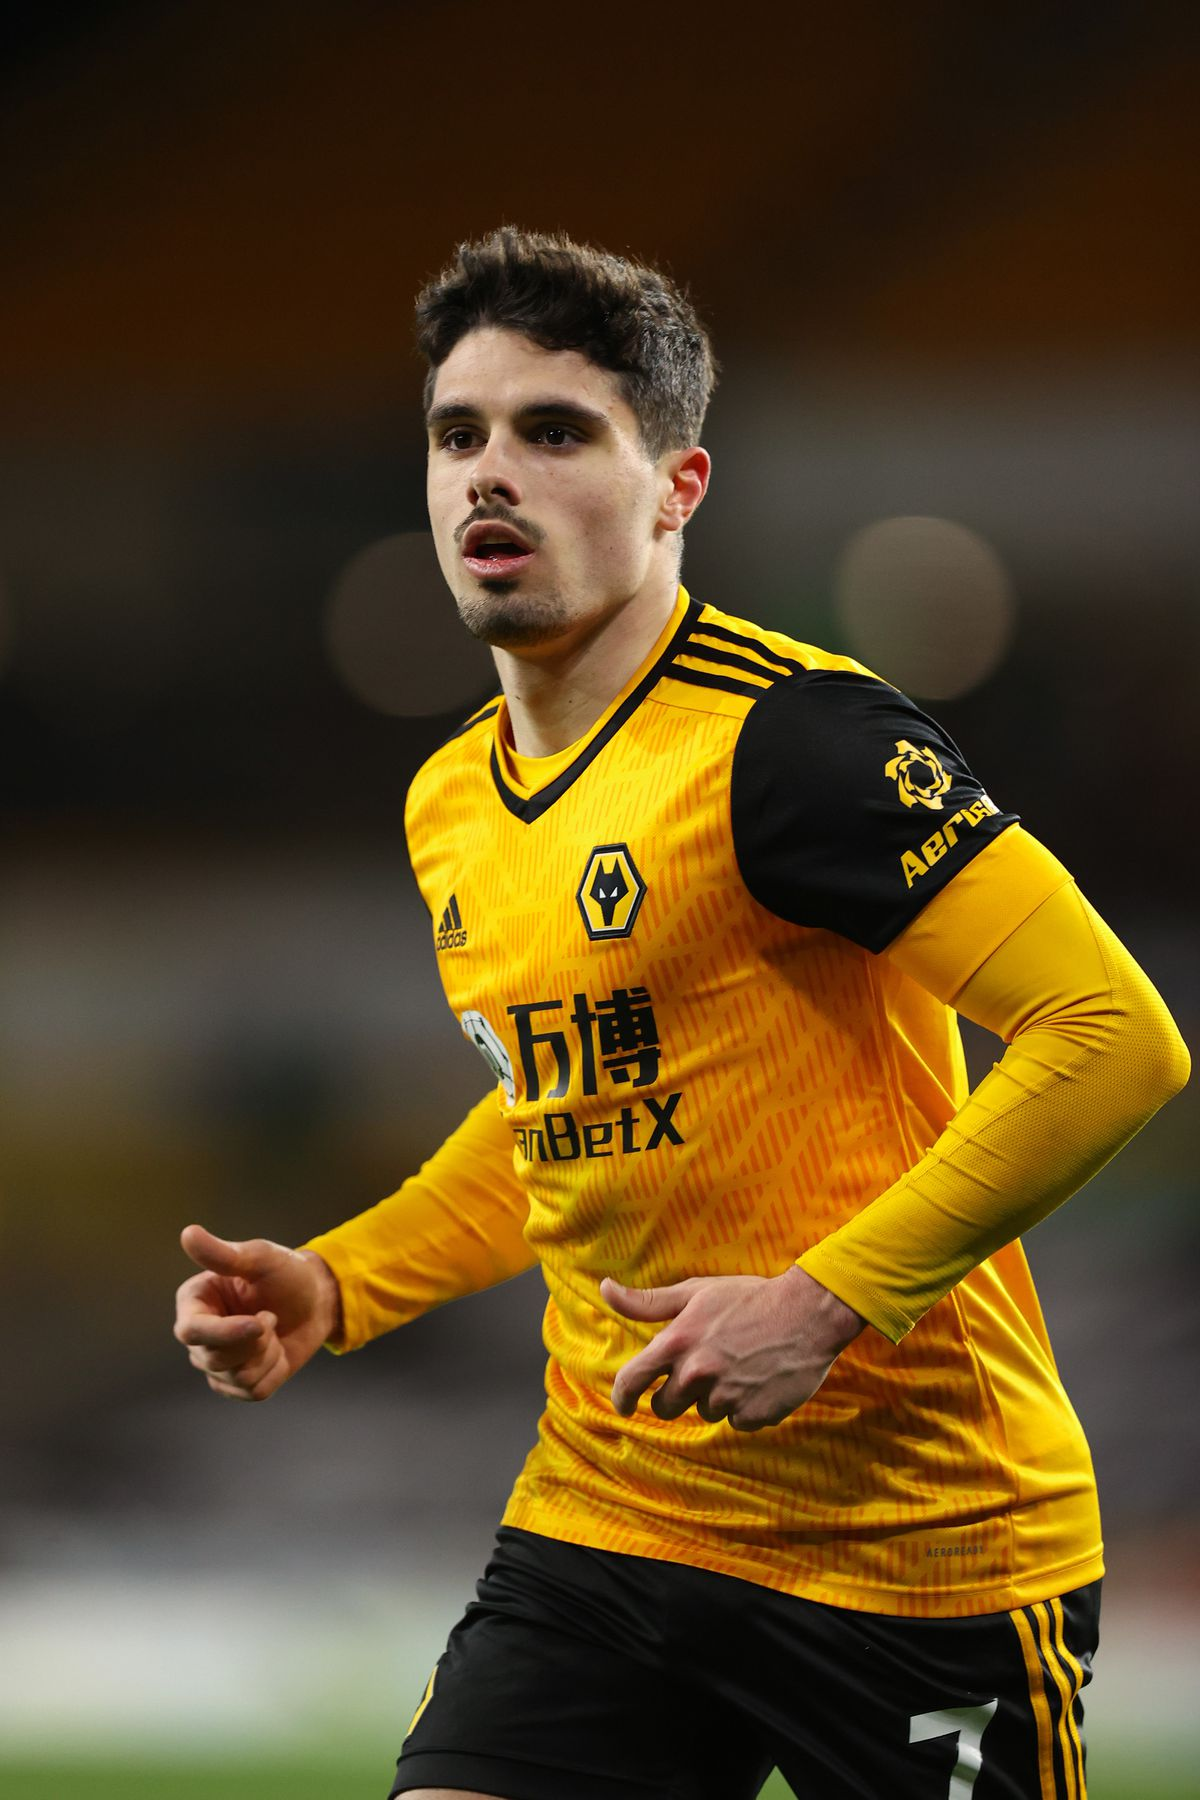 Pedro Neto of Wolverhampton Wanderers. (AMA)